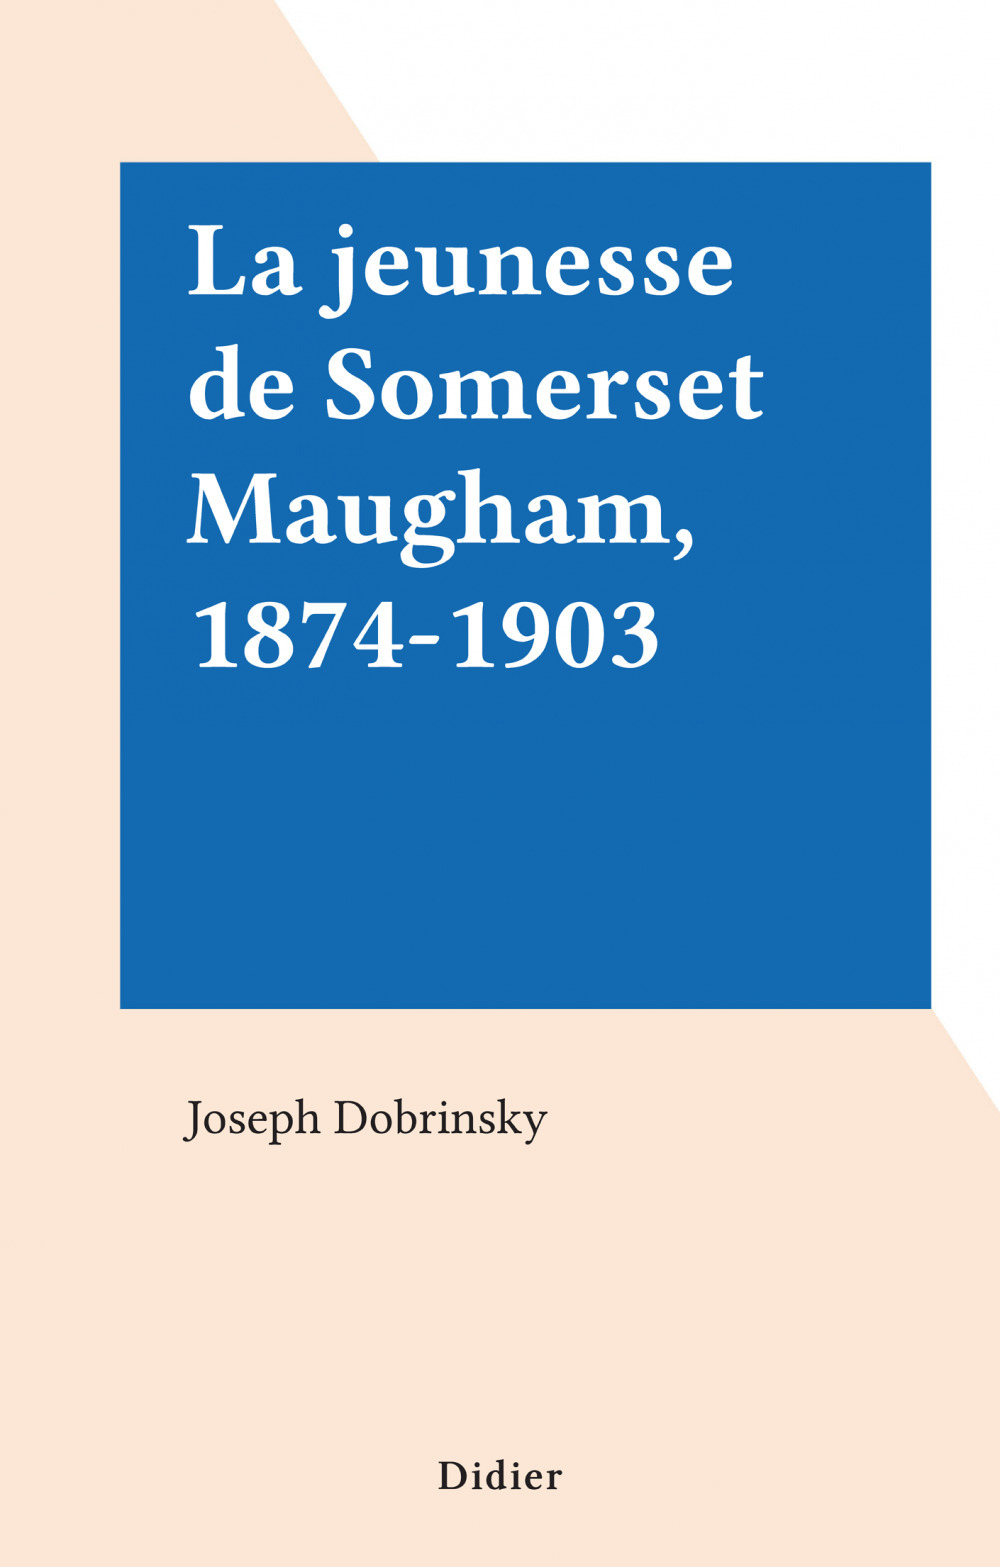 La jeunesse de Somerset Maugham, 1874-1903